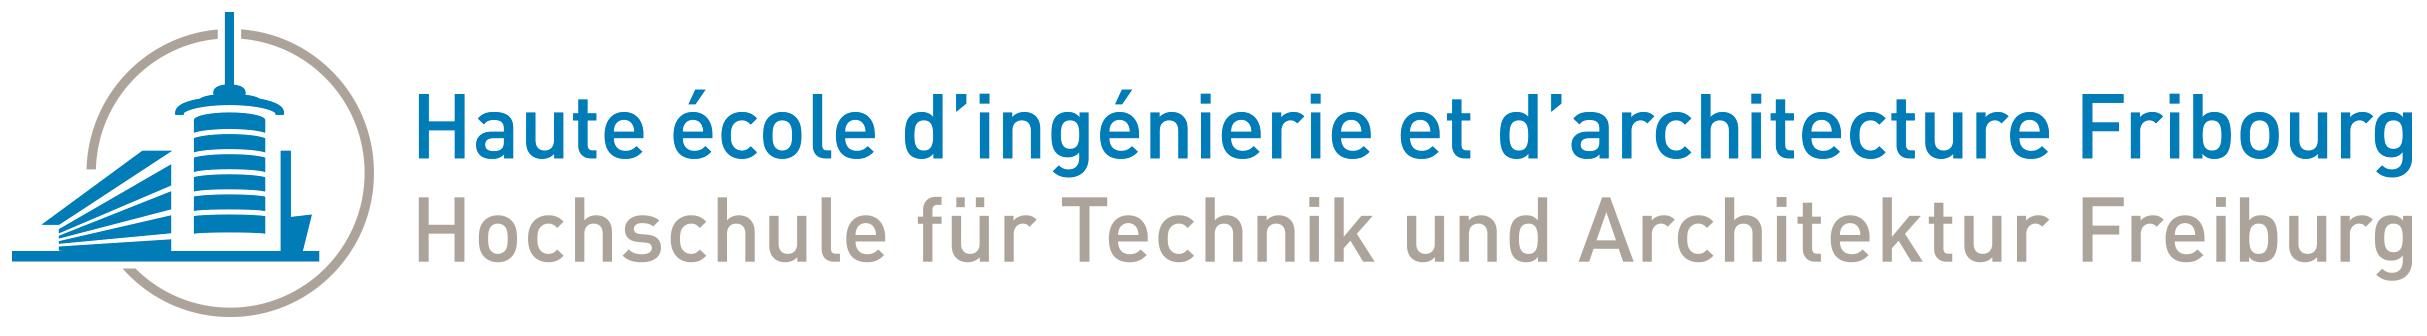 logo_heia-fr.jpg